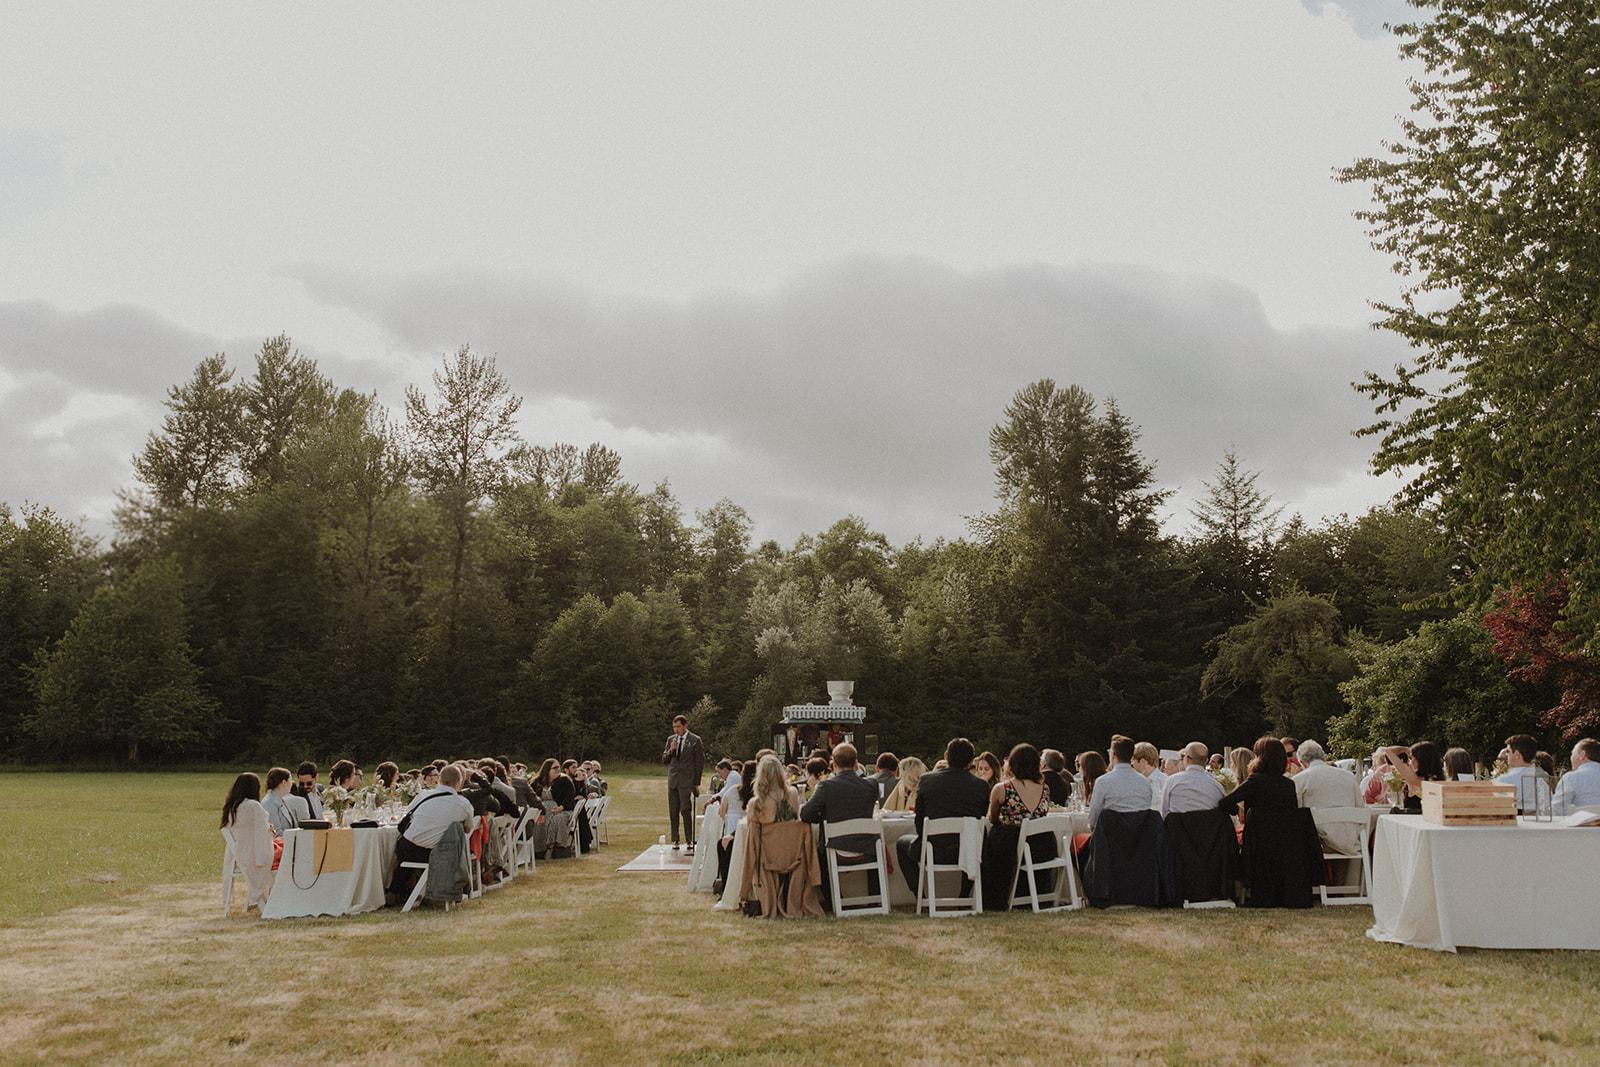 cortney_skye_wedding_june2019-576.jpg